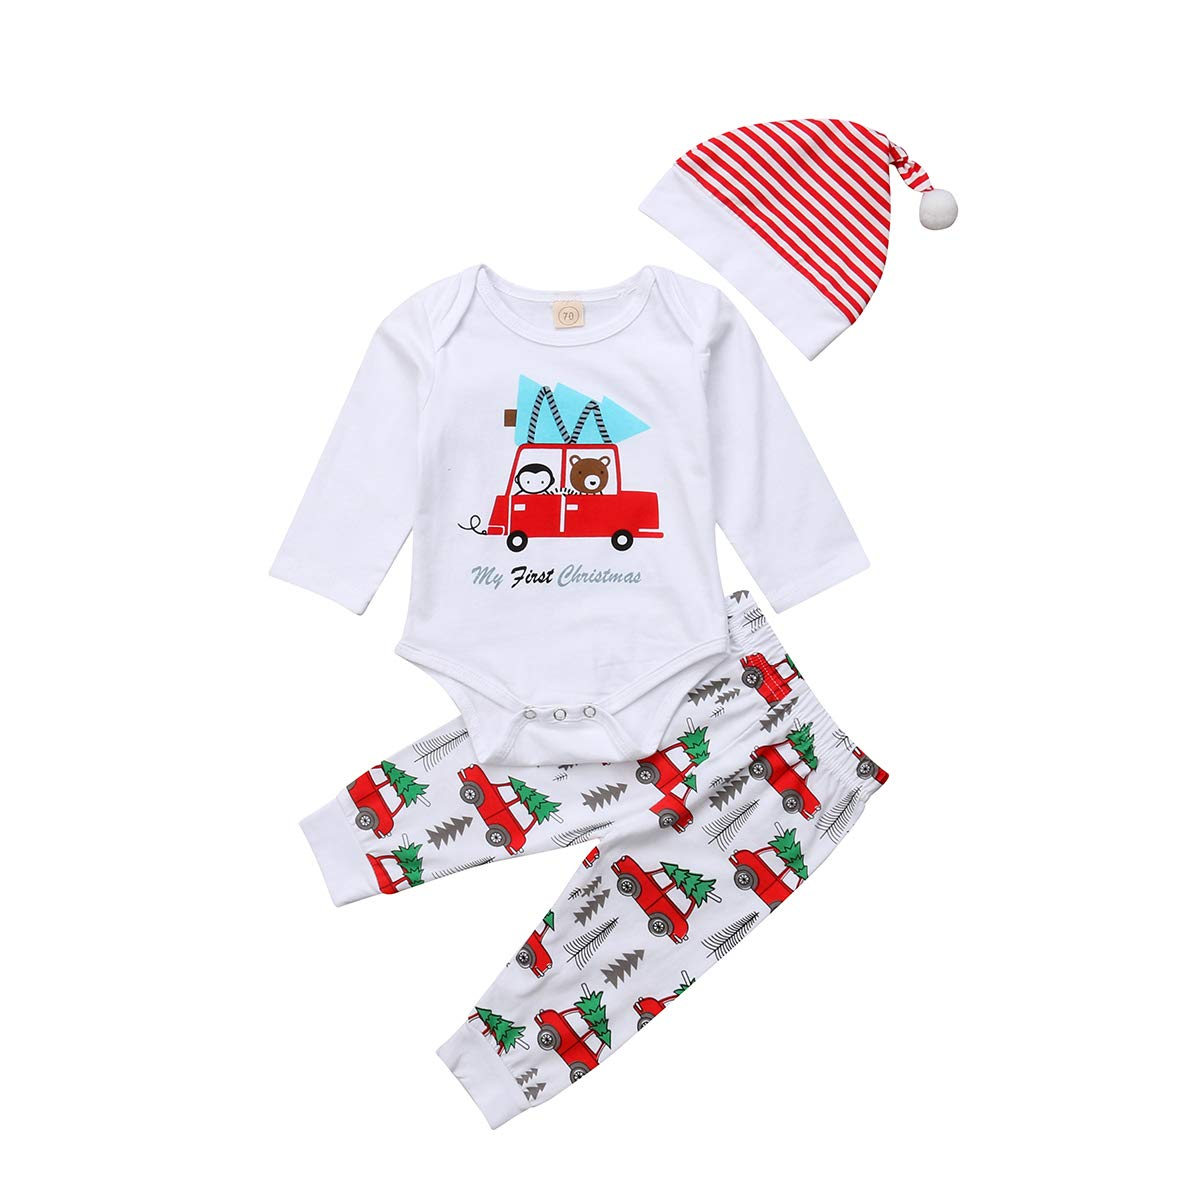 c3ada4bde Amazon.com: Lamuusaa Newborn Toddler Baby Girl/Boy Christmas Outfit My  First Christmas Romper Bodysuit + Cartoon Pants + Striped Hat Set: Clothing